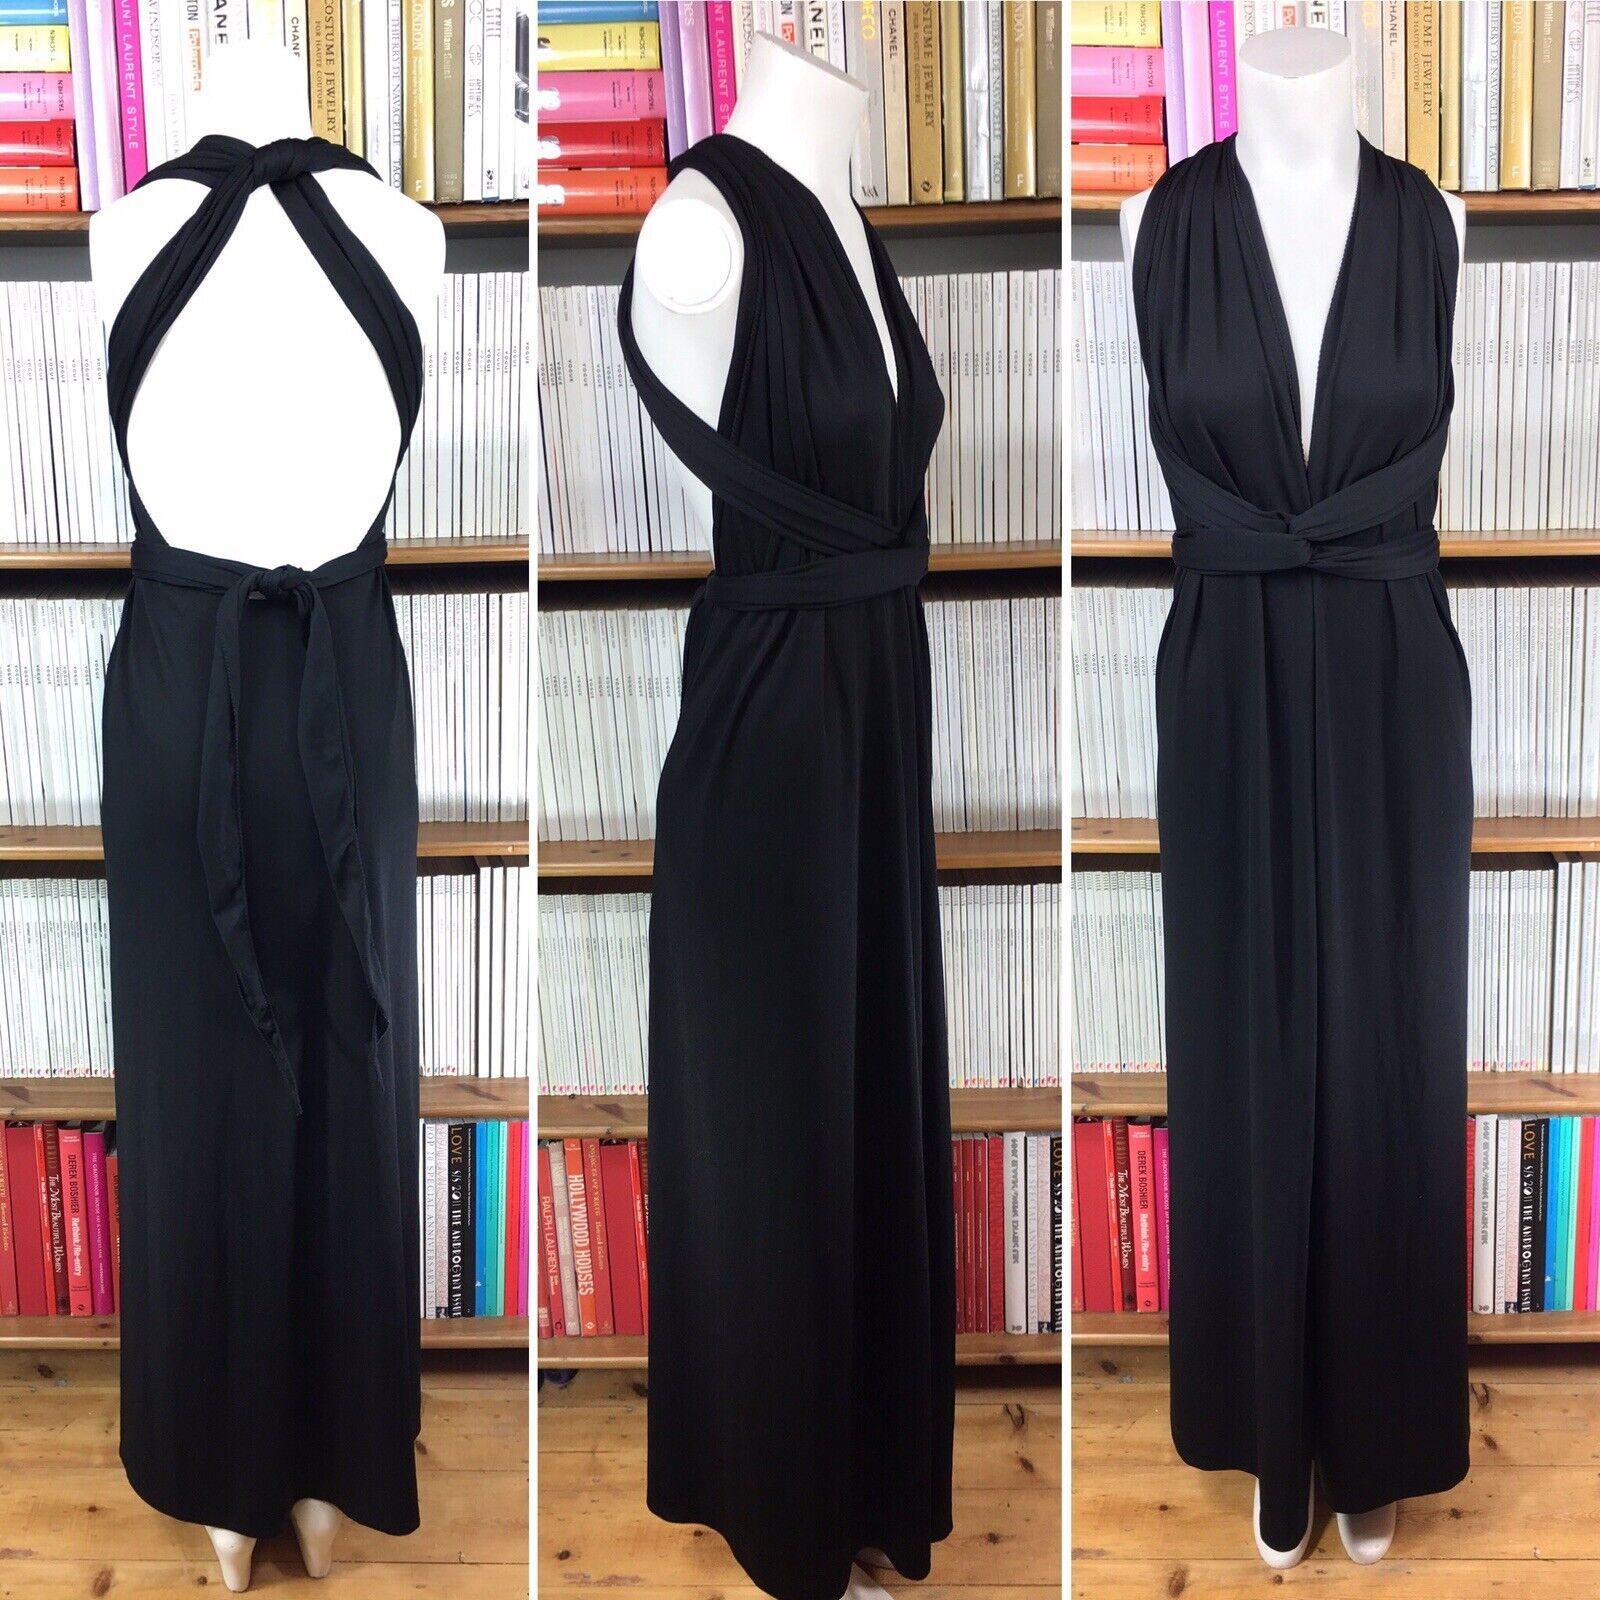 Vintage 1970s grecian draped dress multi-way maxi plunge US 4 6 8